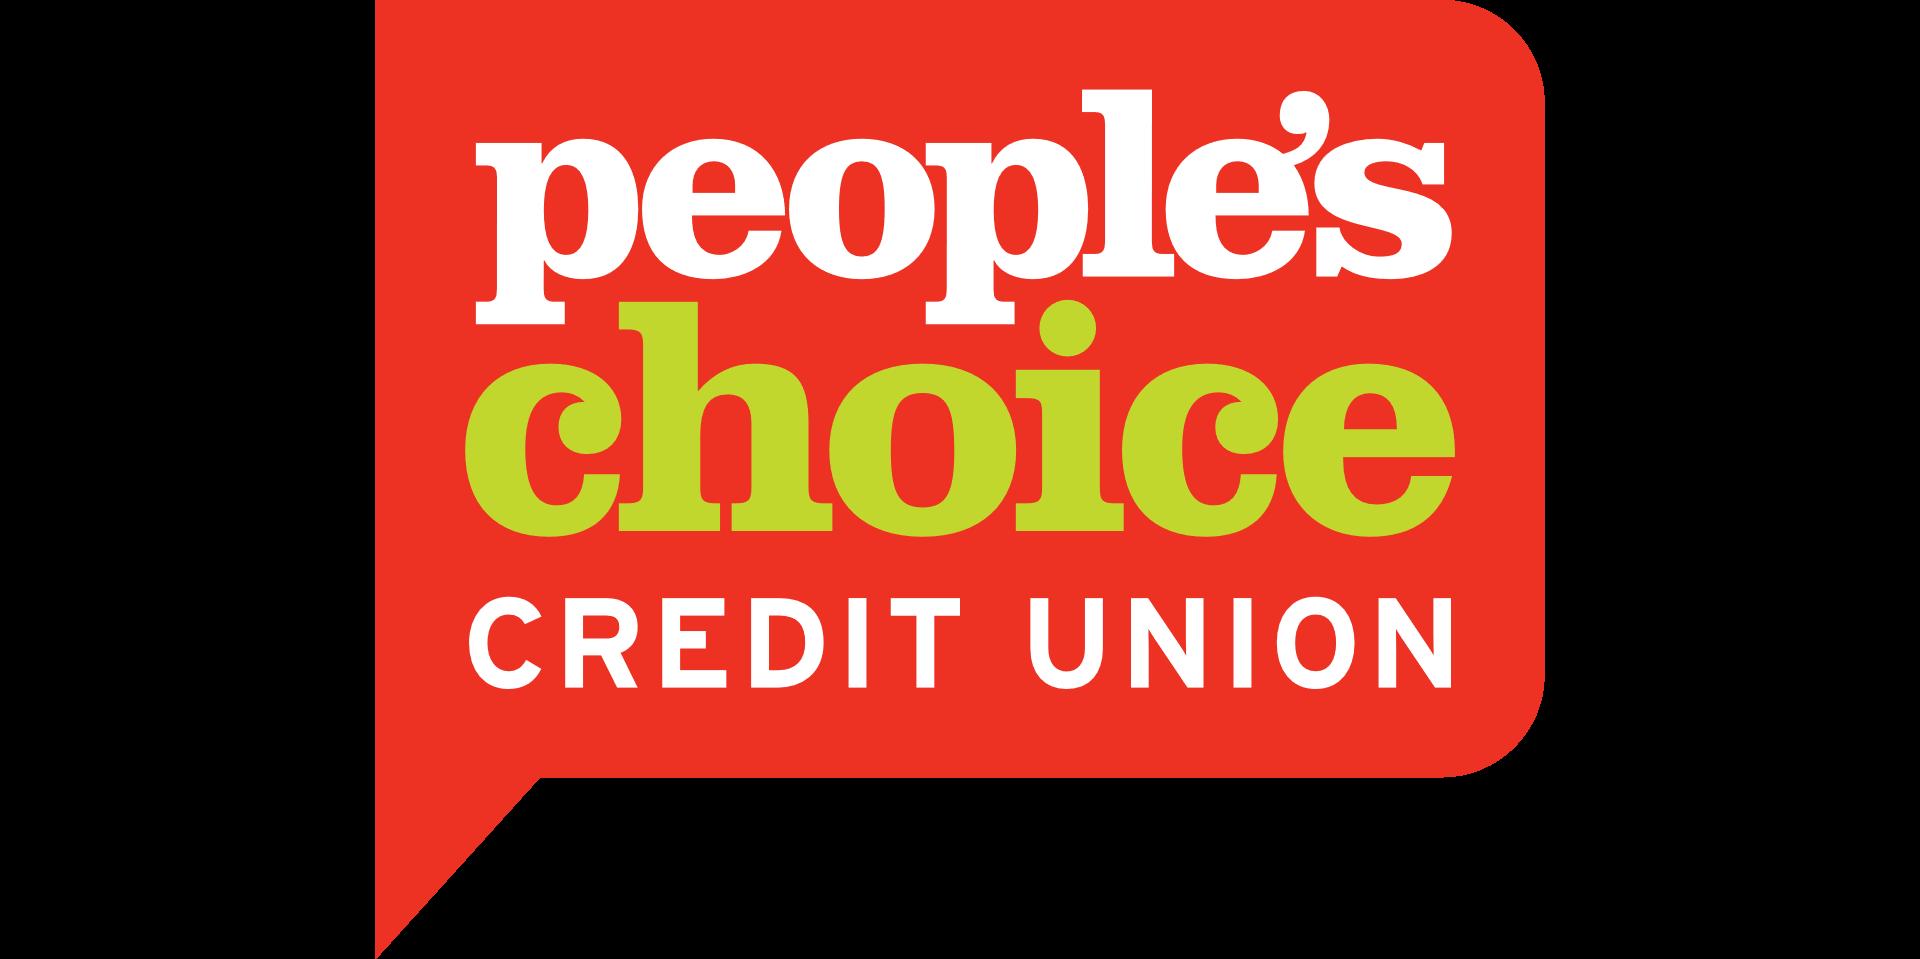 People's Choice Credit Union - Christies Beach, SA 5165 - 131182   ShowMeLocal.com